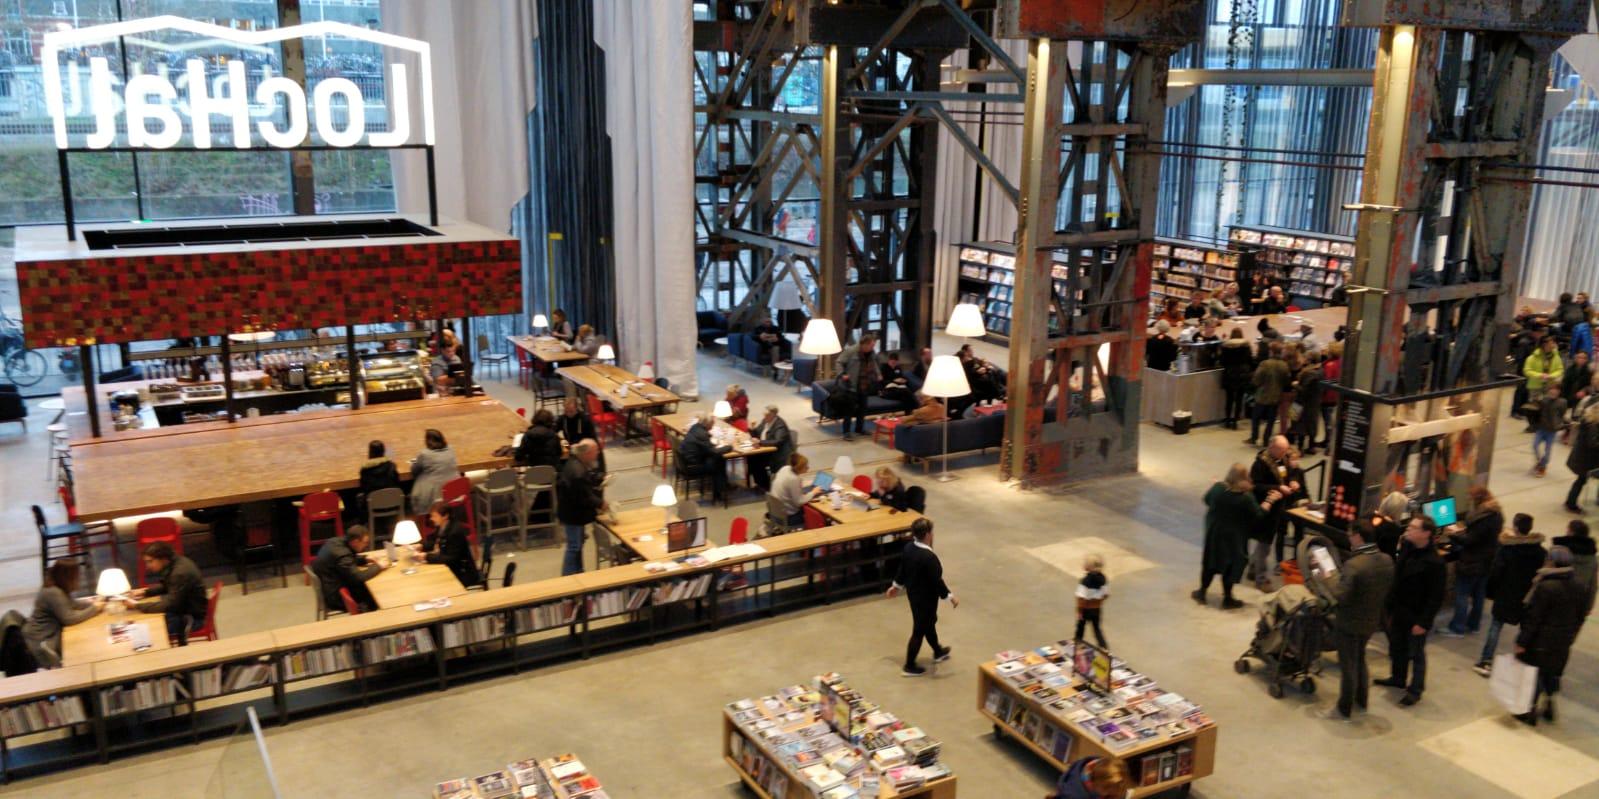 bibliotheek tilburg lochal